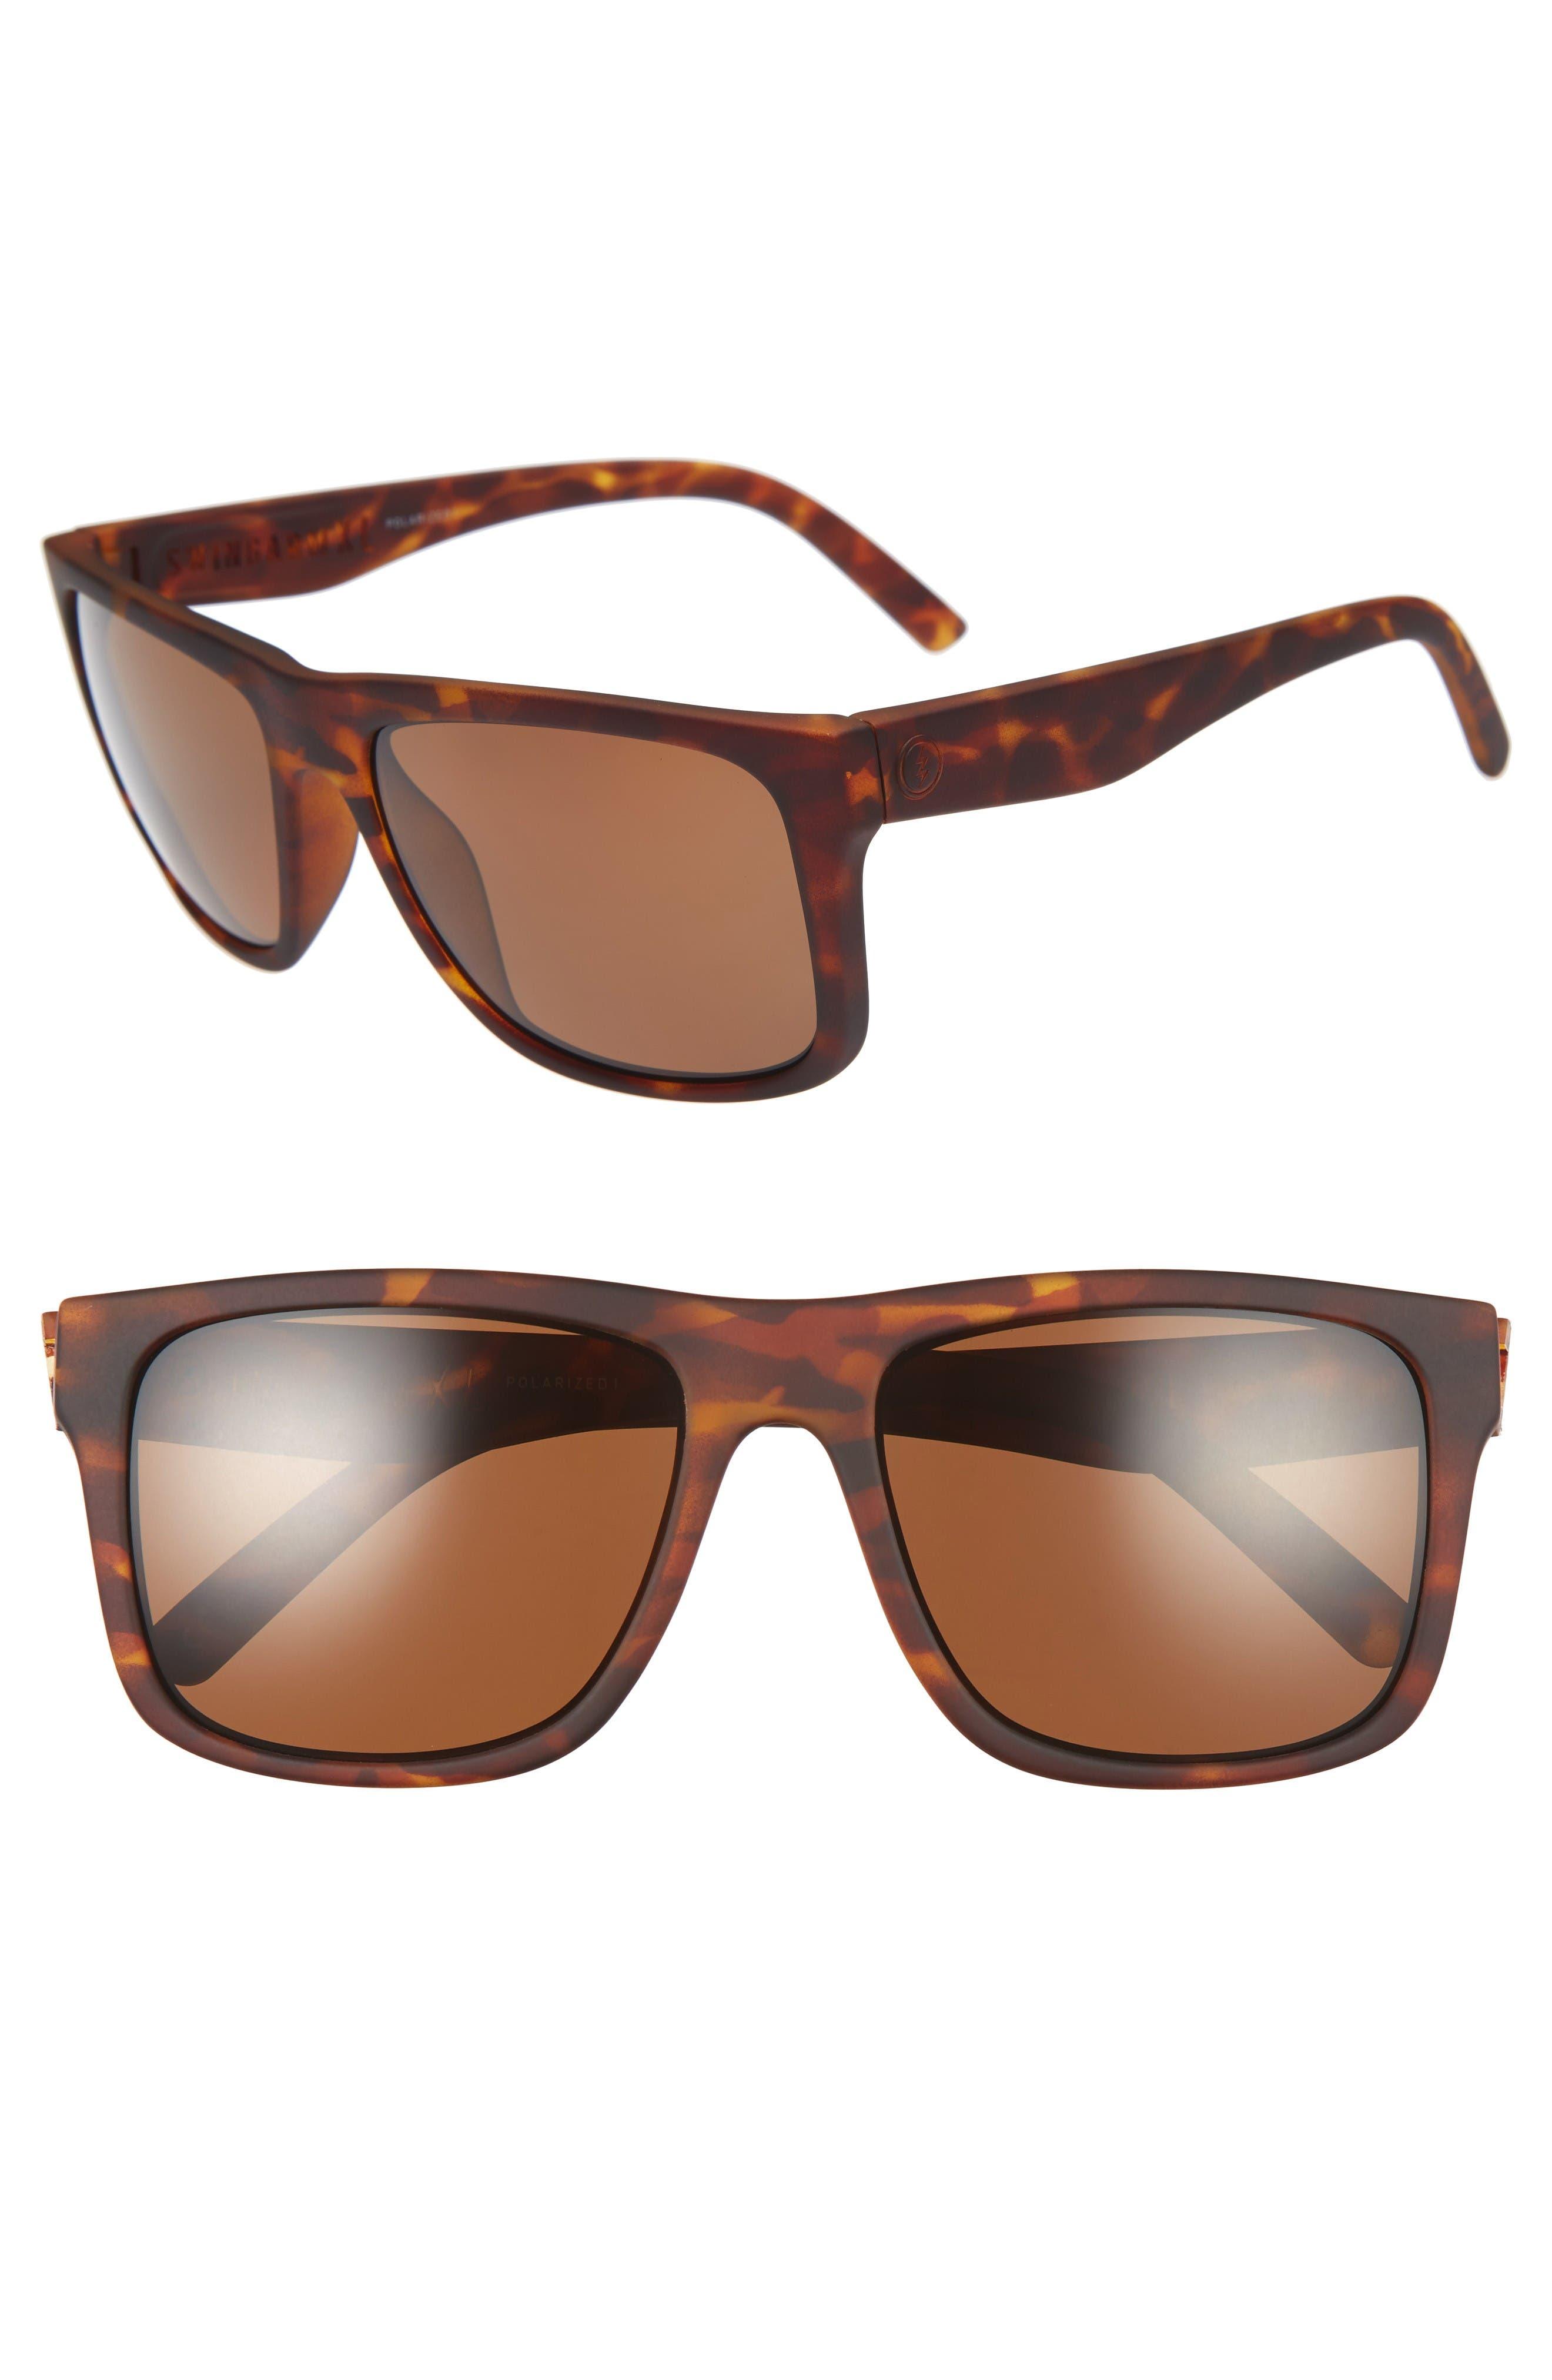 Alternate Image 1 Selected - ELECTRIC Swingarm XL 59mm Polarized Sunglasses